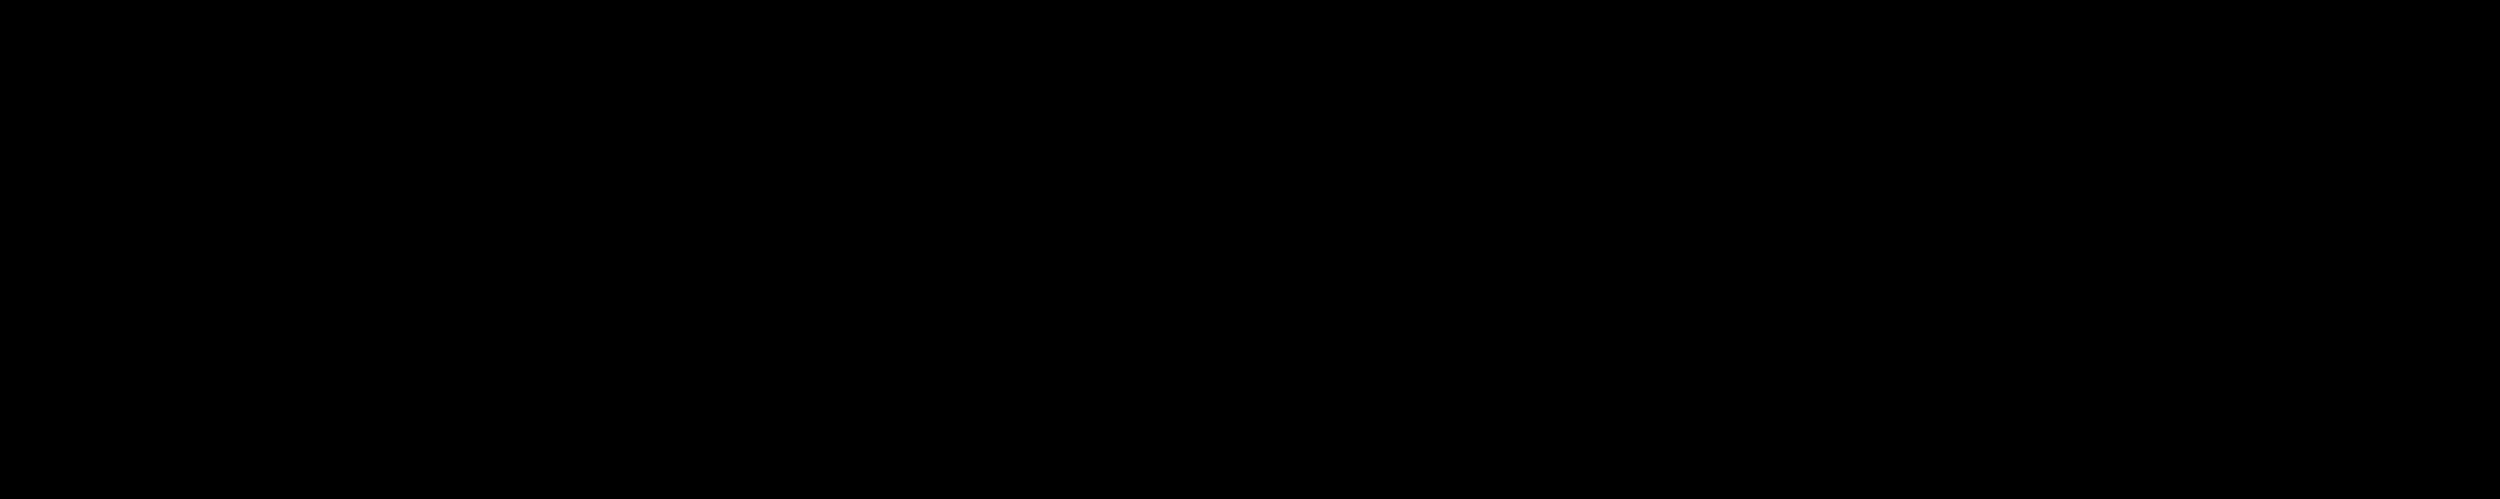 CURIOSITY logo horizontal BLACK.png